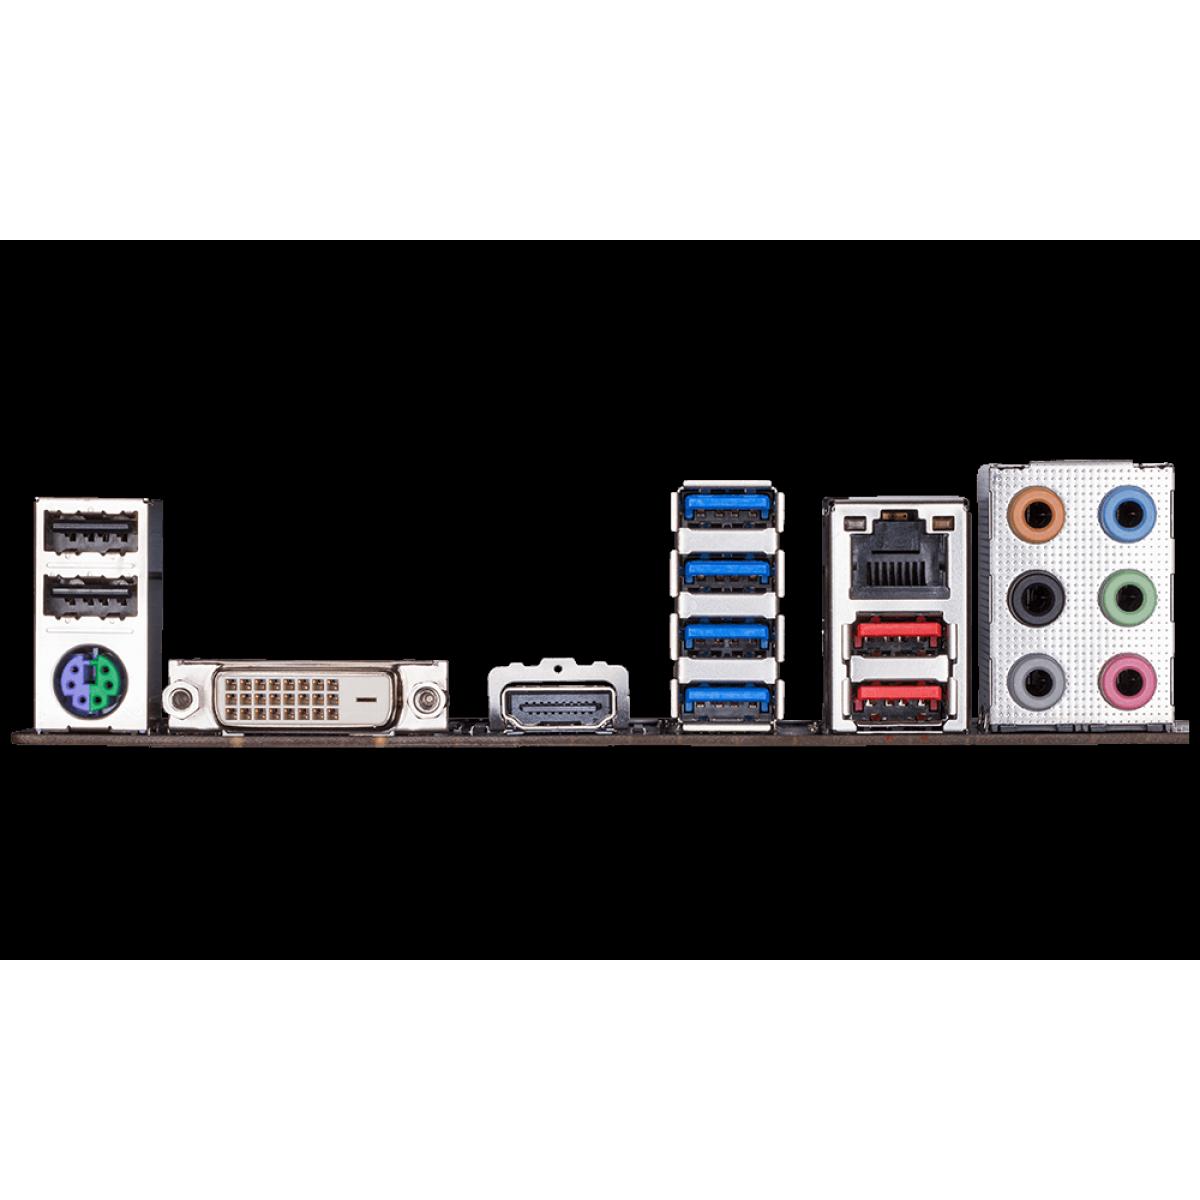 Placa Mãe Gigabyte B450M AORUS ELITE, Chipset B450, AMD AM4, mATX, DDR4